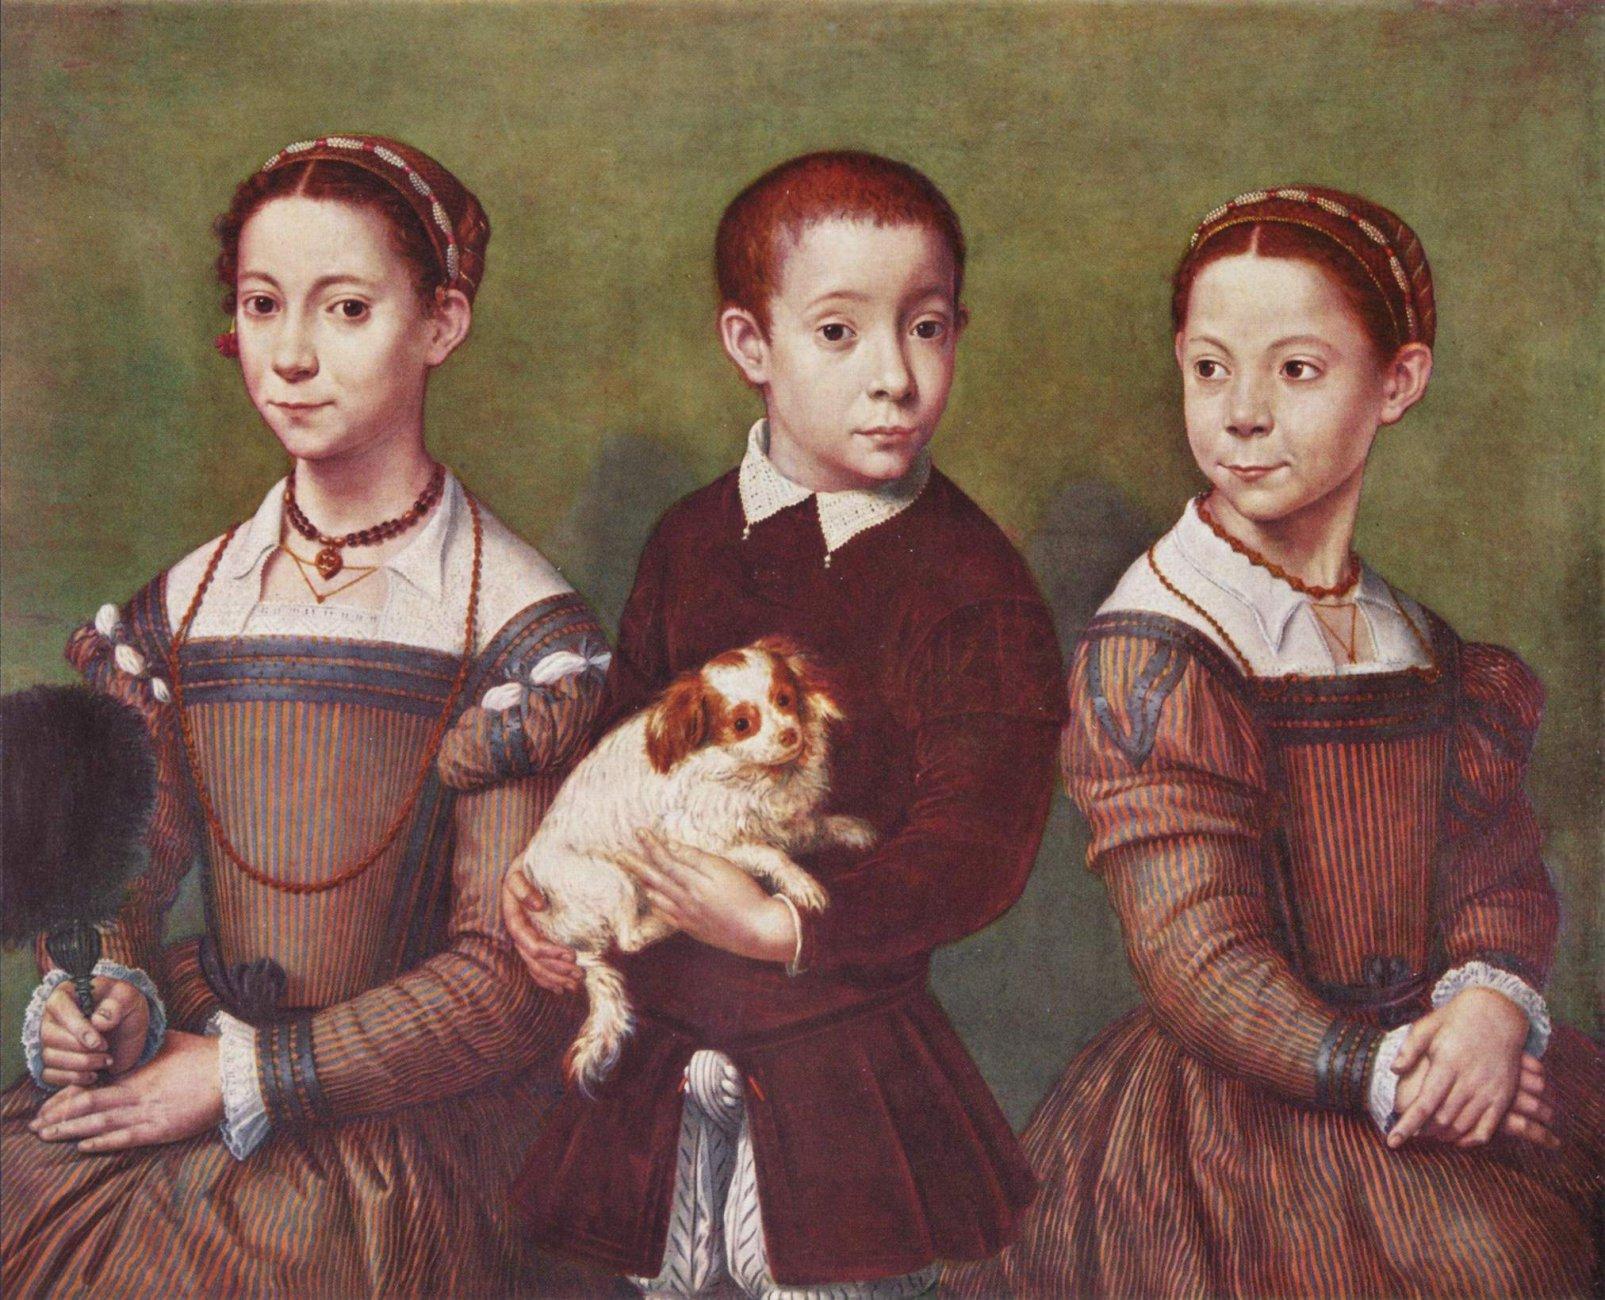 Sofonisba_Anguissola_001.jpg